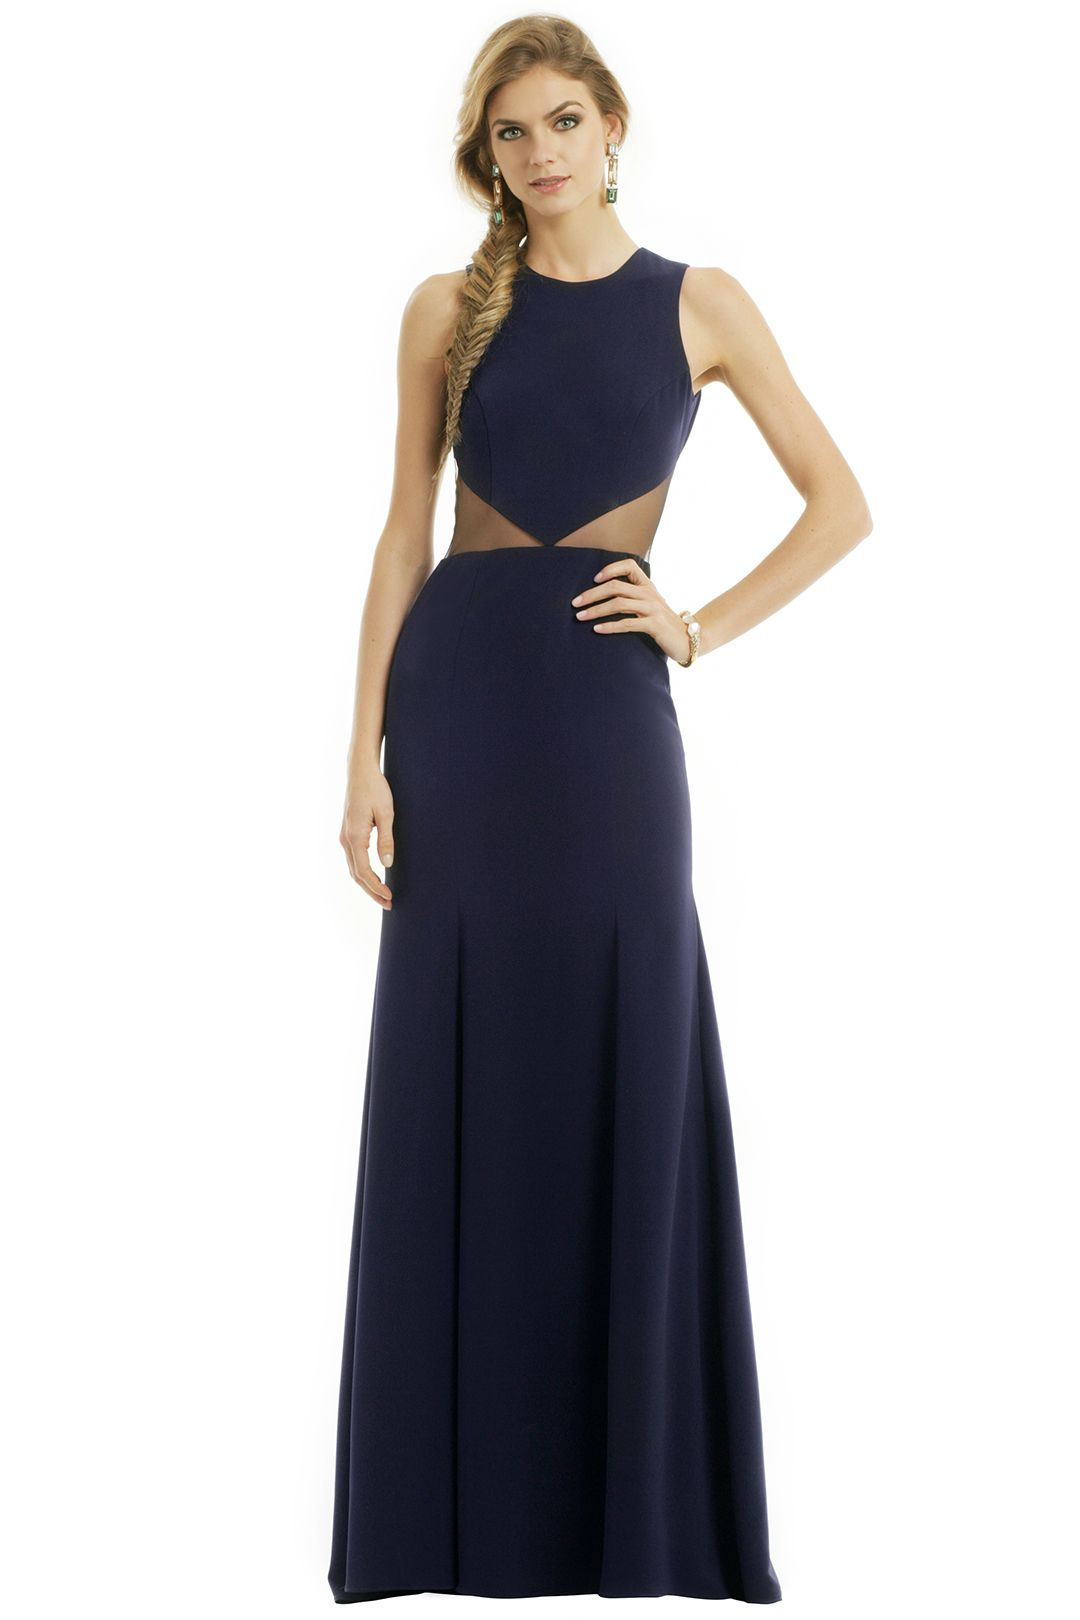 Simplicity Gown   Shops, UX/UI Designer and Dresses